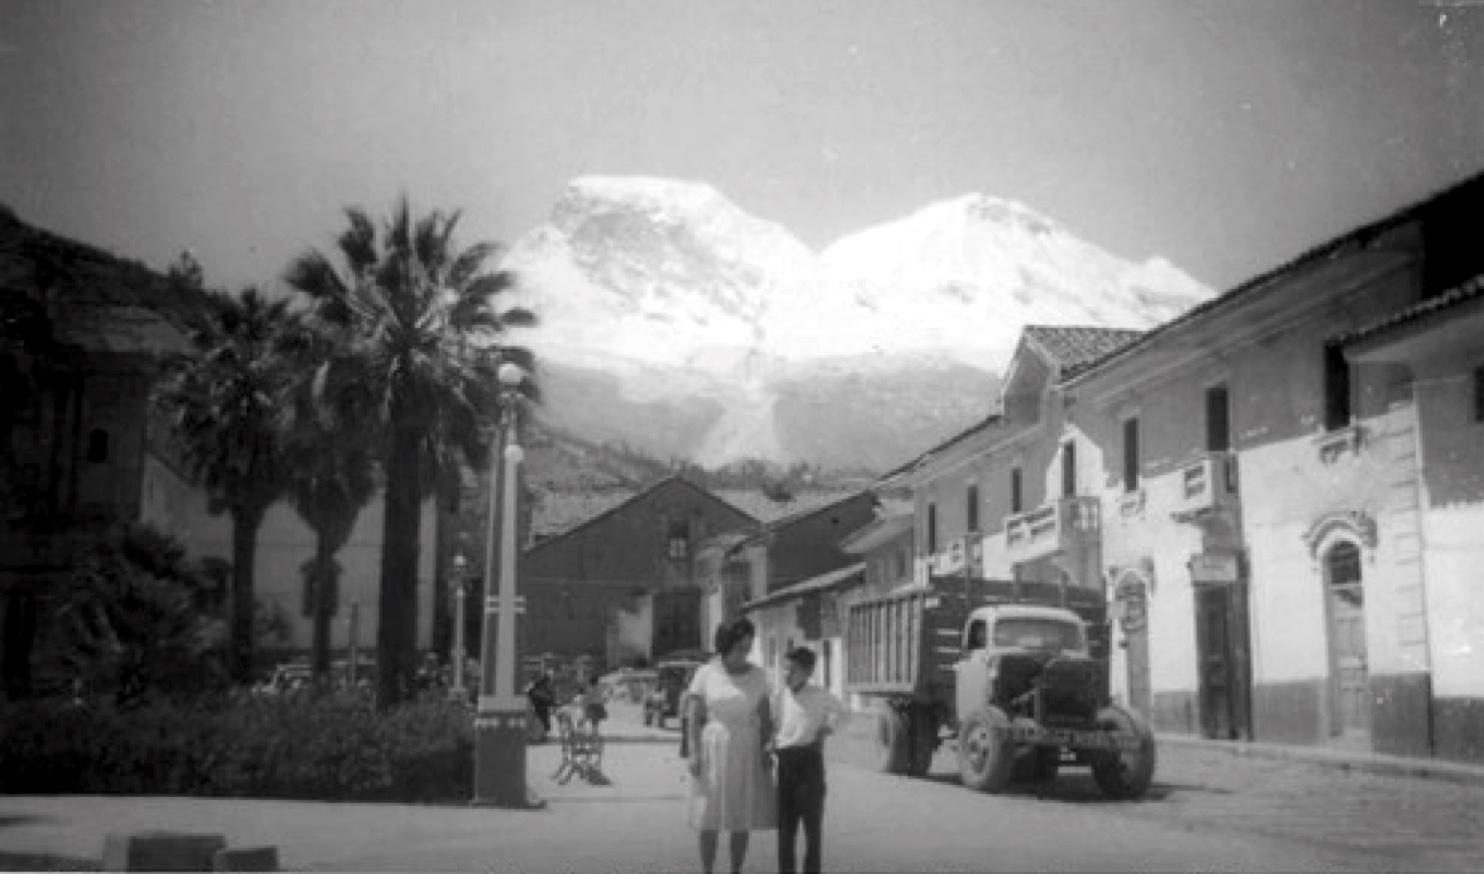 Yungay, Peru in 1966